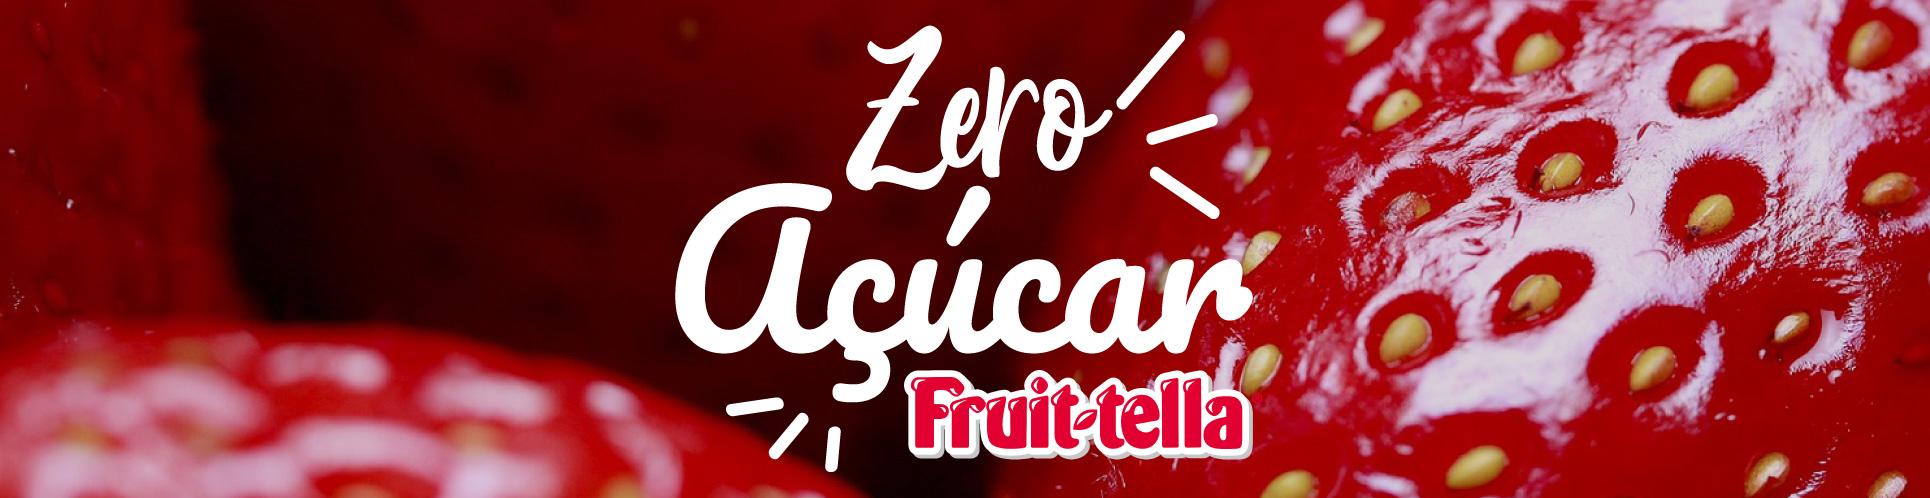 Fruittella-bala